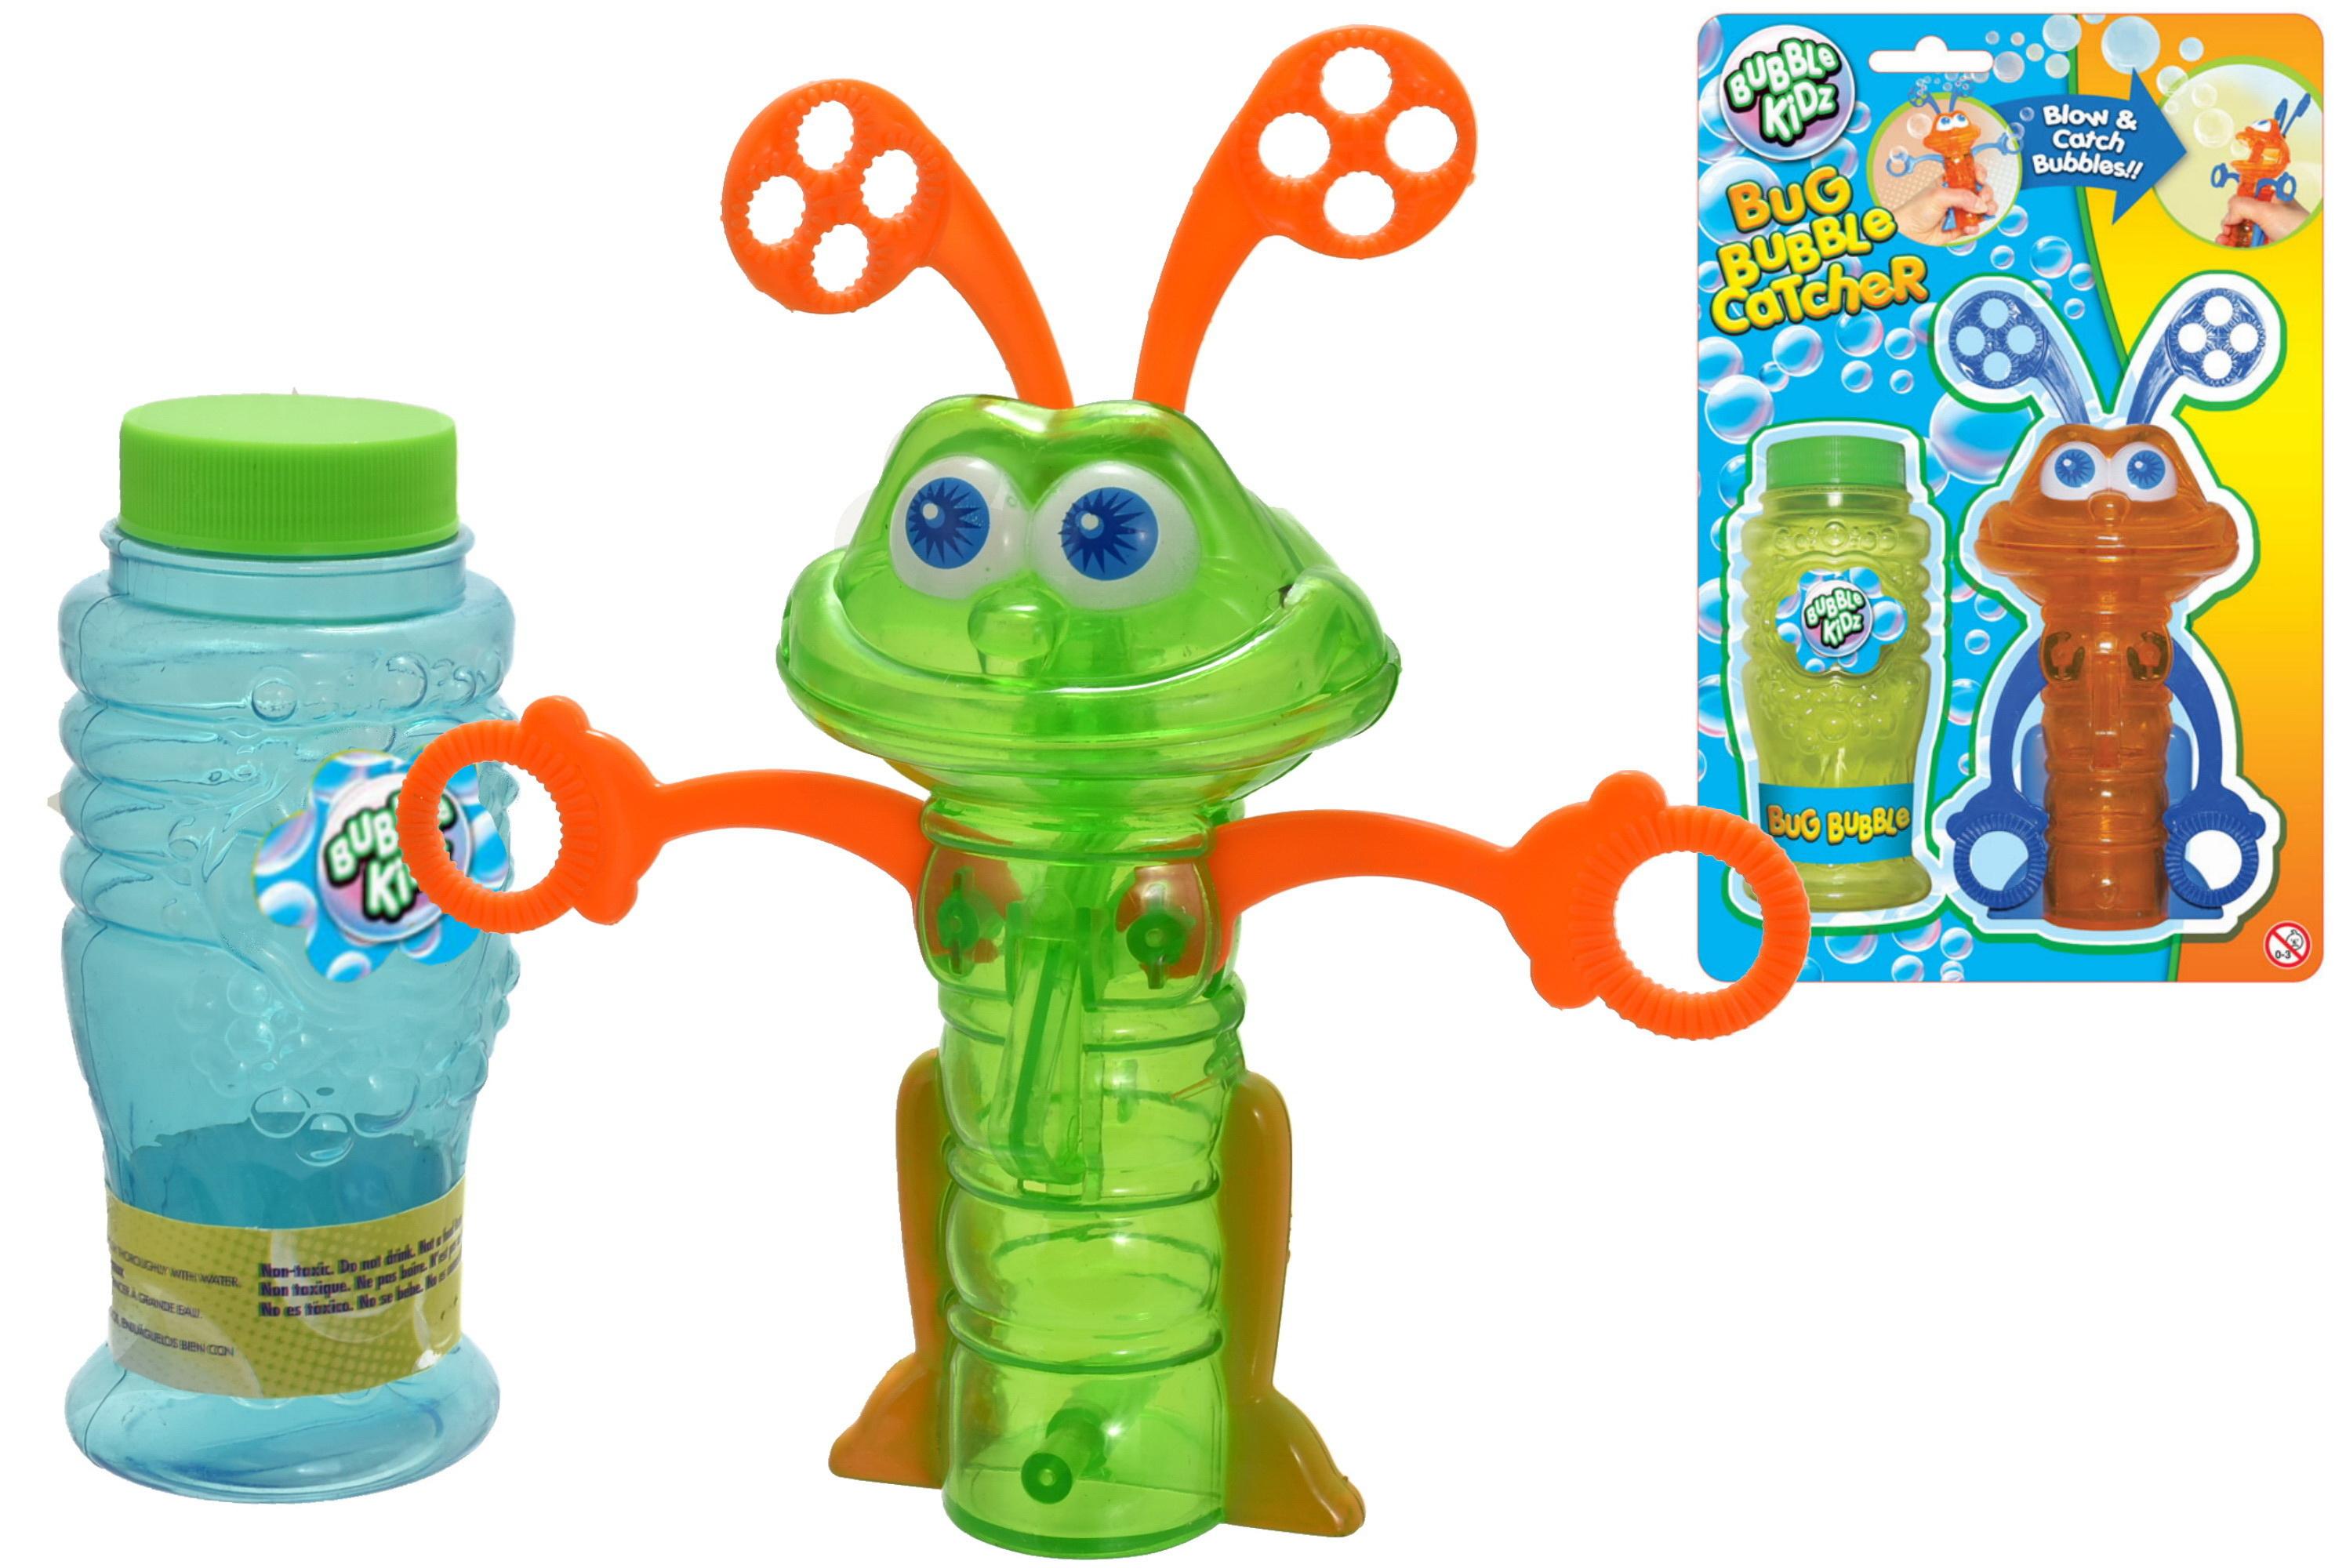 Bug Bubble Catcher (2 Assorted Colours) Playset